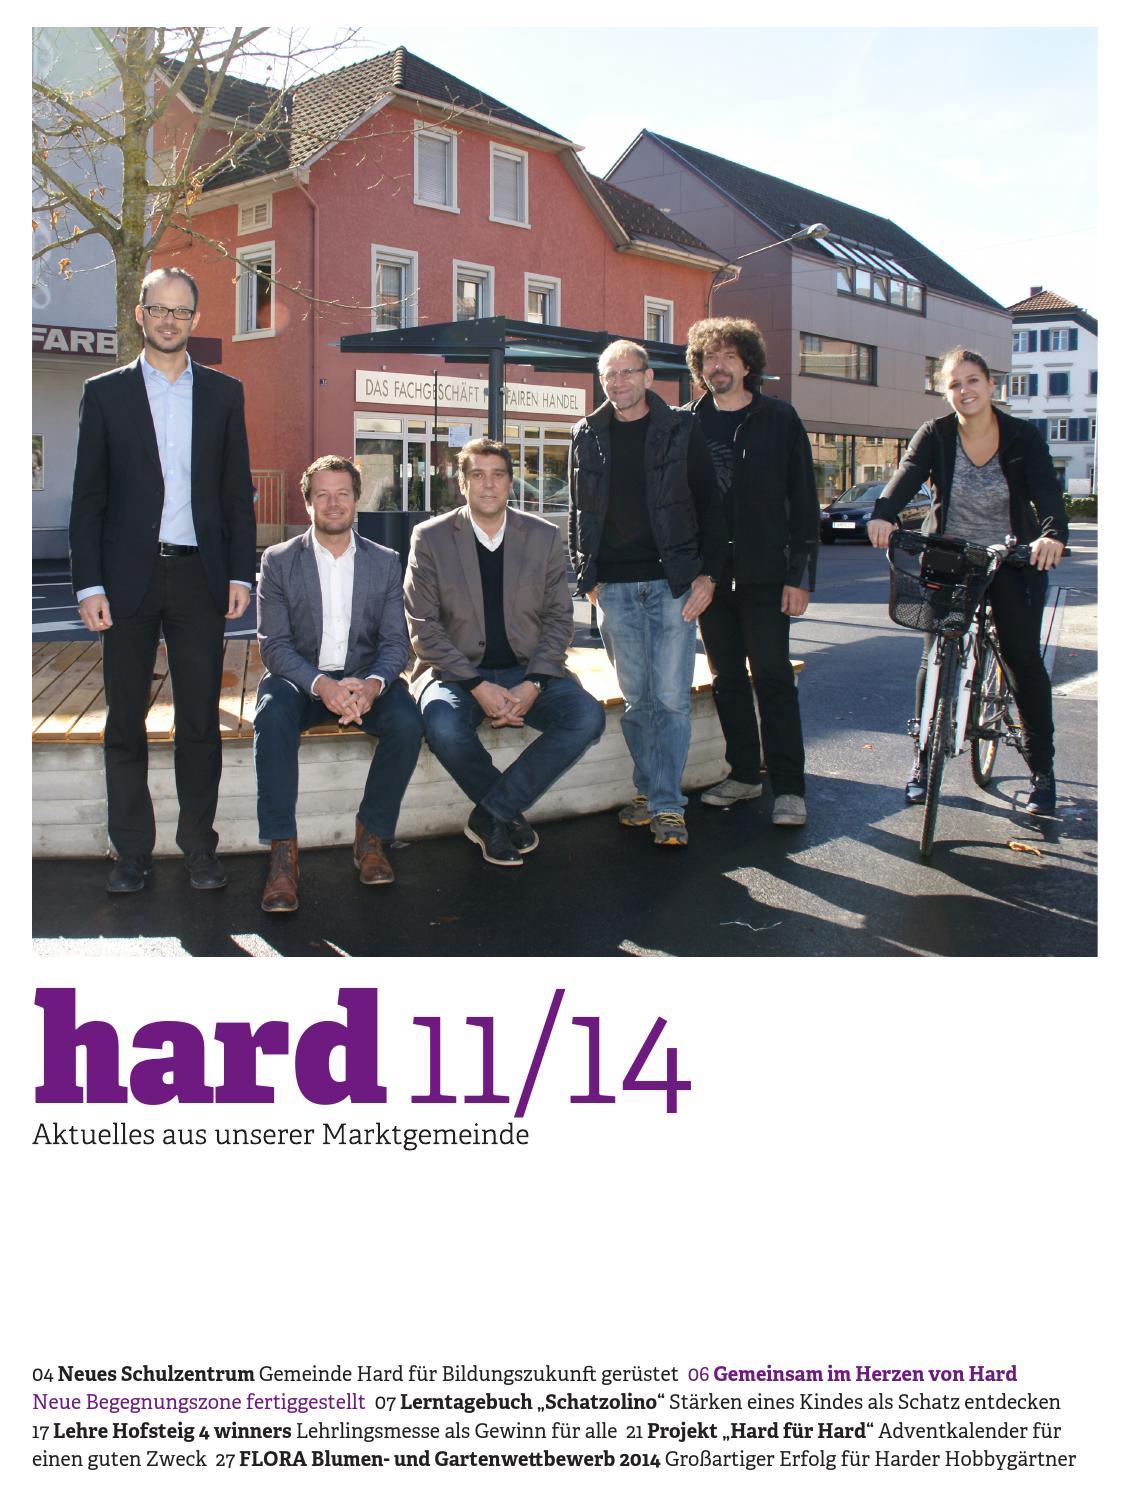 singles in Hard - Bekanntschaften - Partnersuche & Kontakte